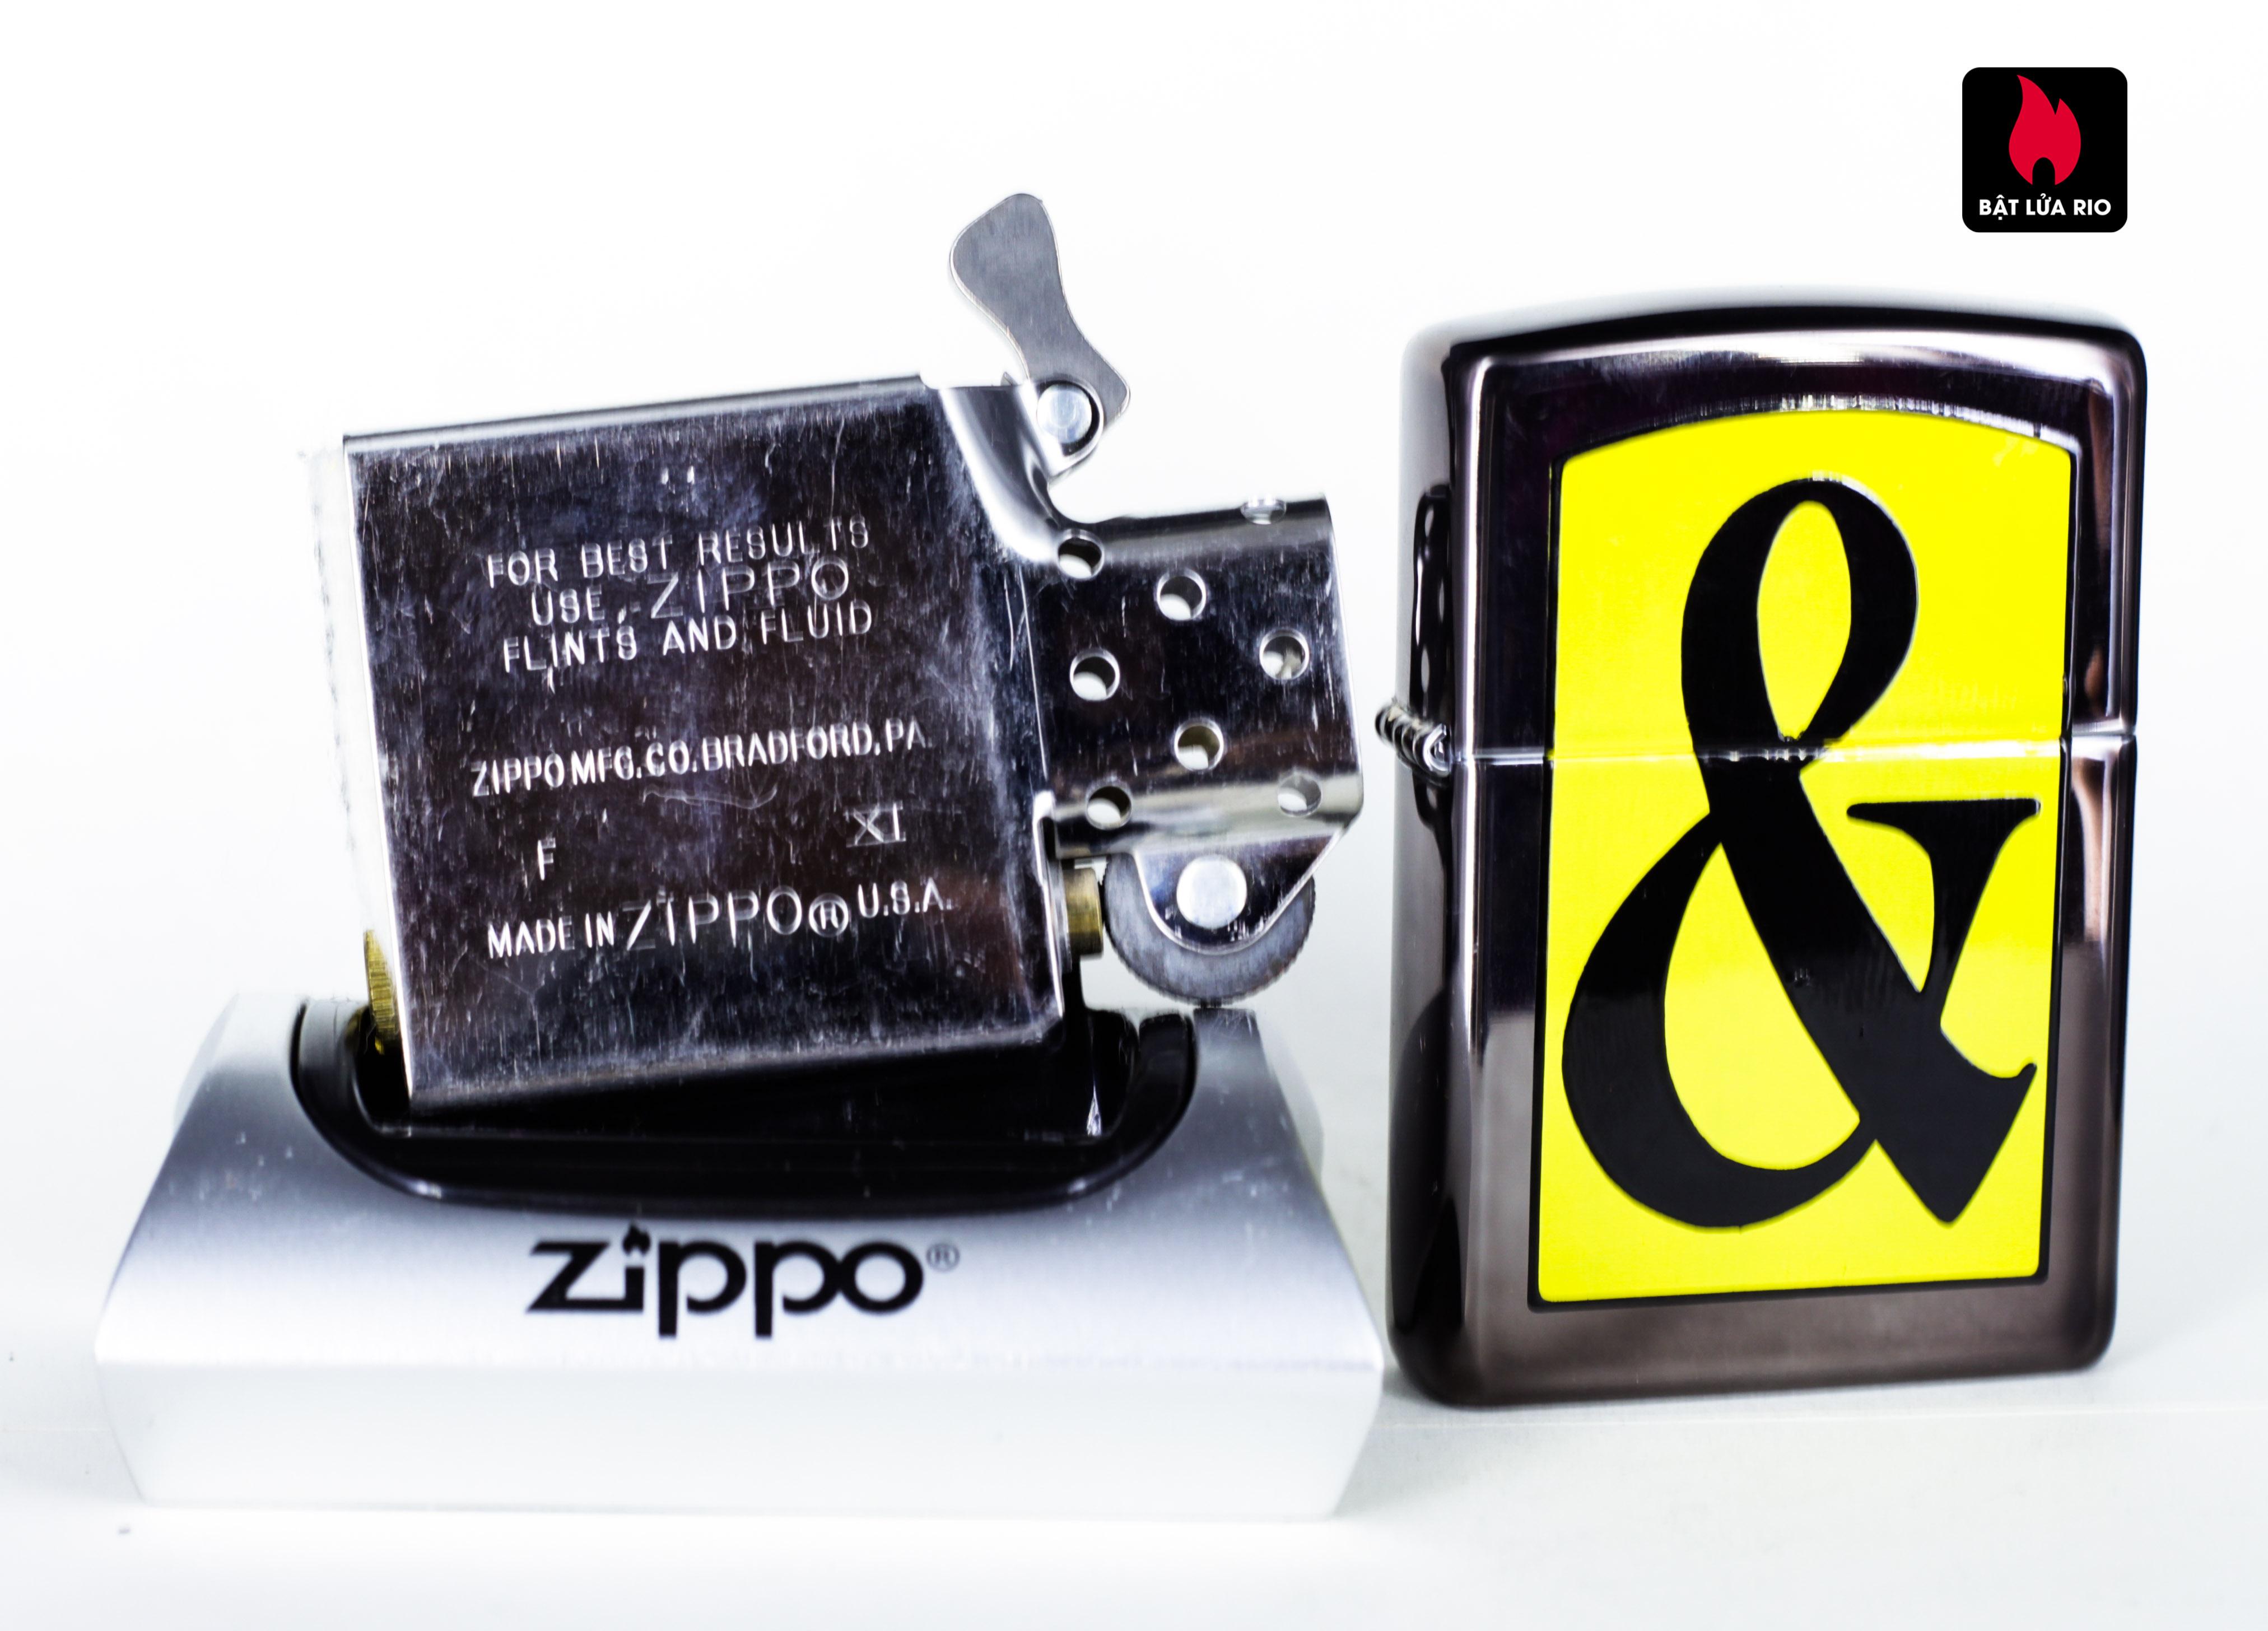 ZIPPO LA MÃ 1995 - BARRETT SMYTHE COMIC STRIP - &